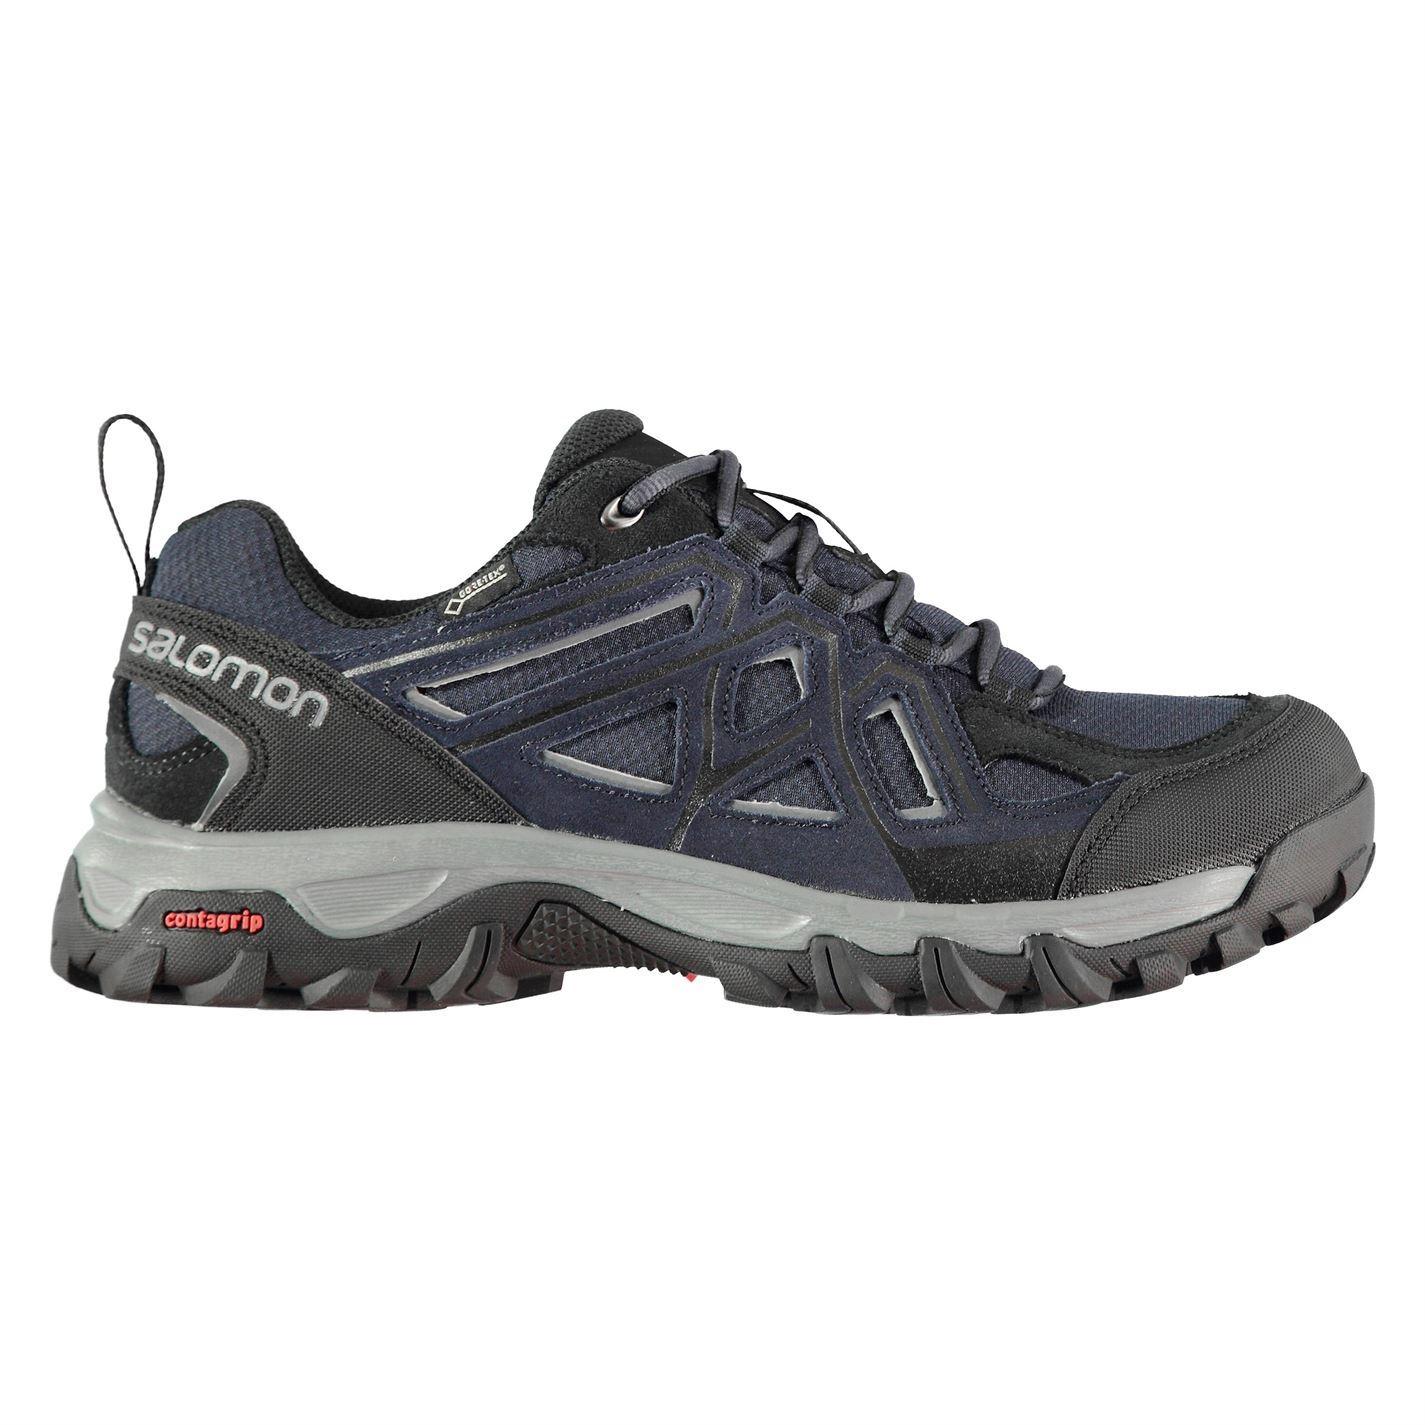 Details about Salomon Evasion 2 GTX Walking Shoes Mens Grey Hiking Footwear Boots